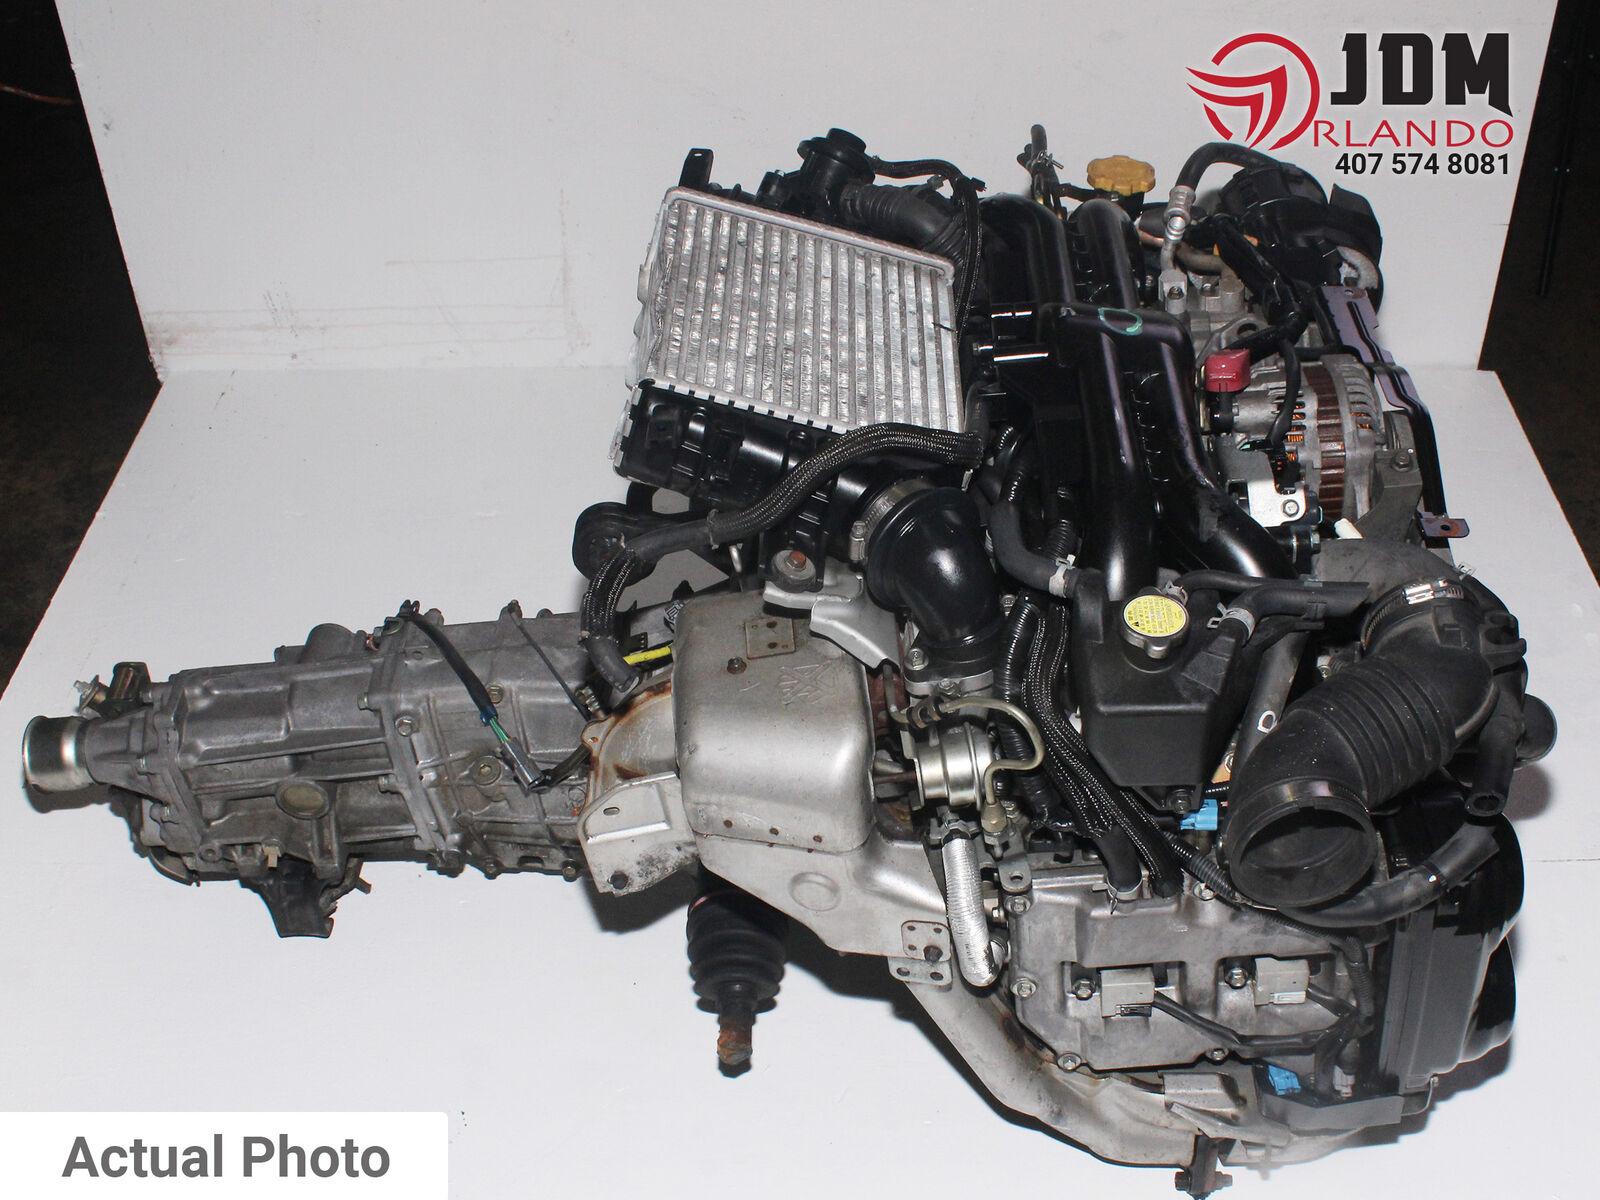 08 12 Subaru Impreza Wrx 2 0l Turbo Replacement Engine 5 Speed Trans Jdm Ej20y